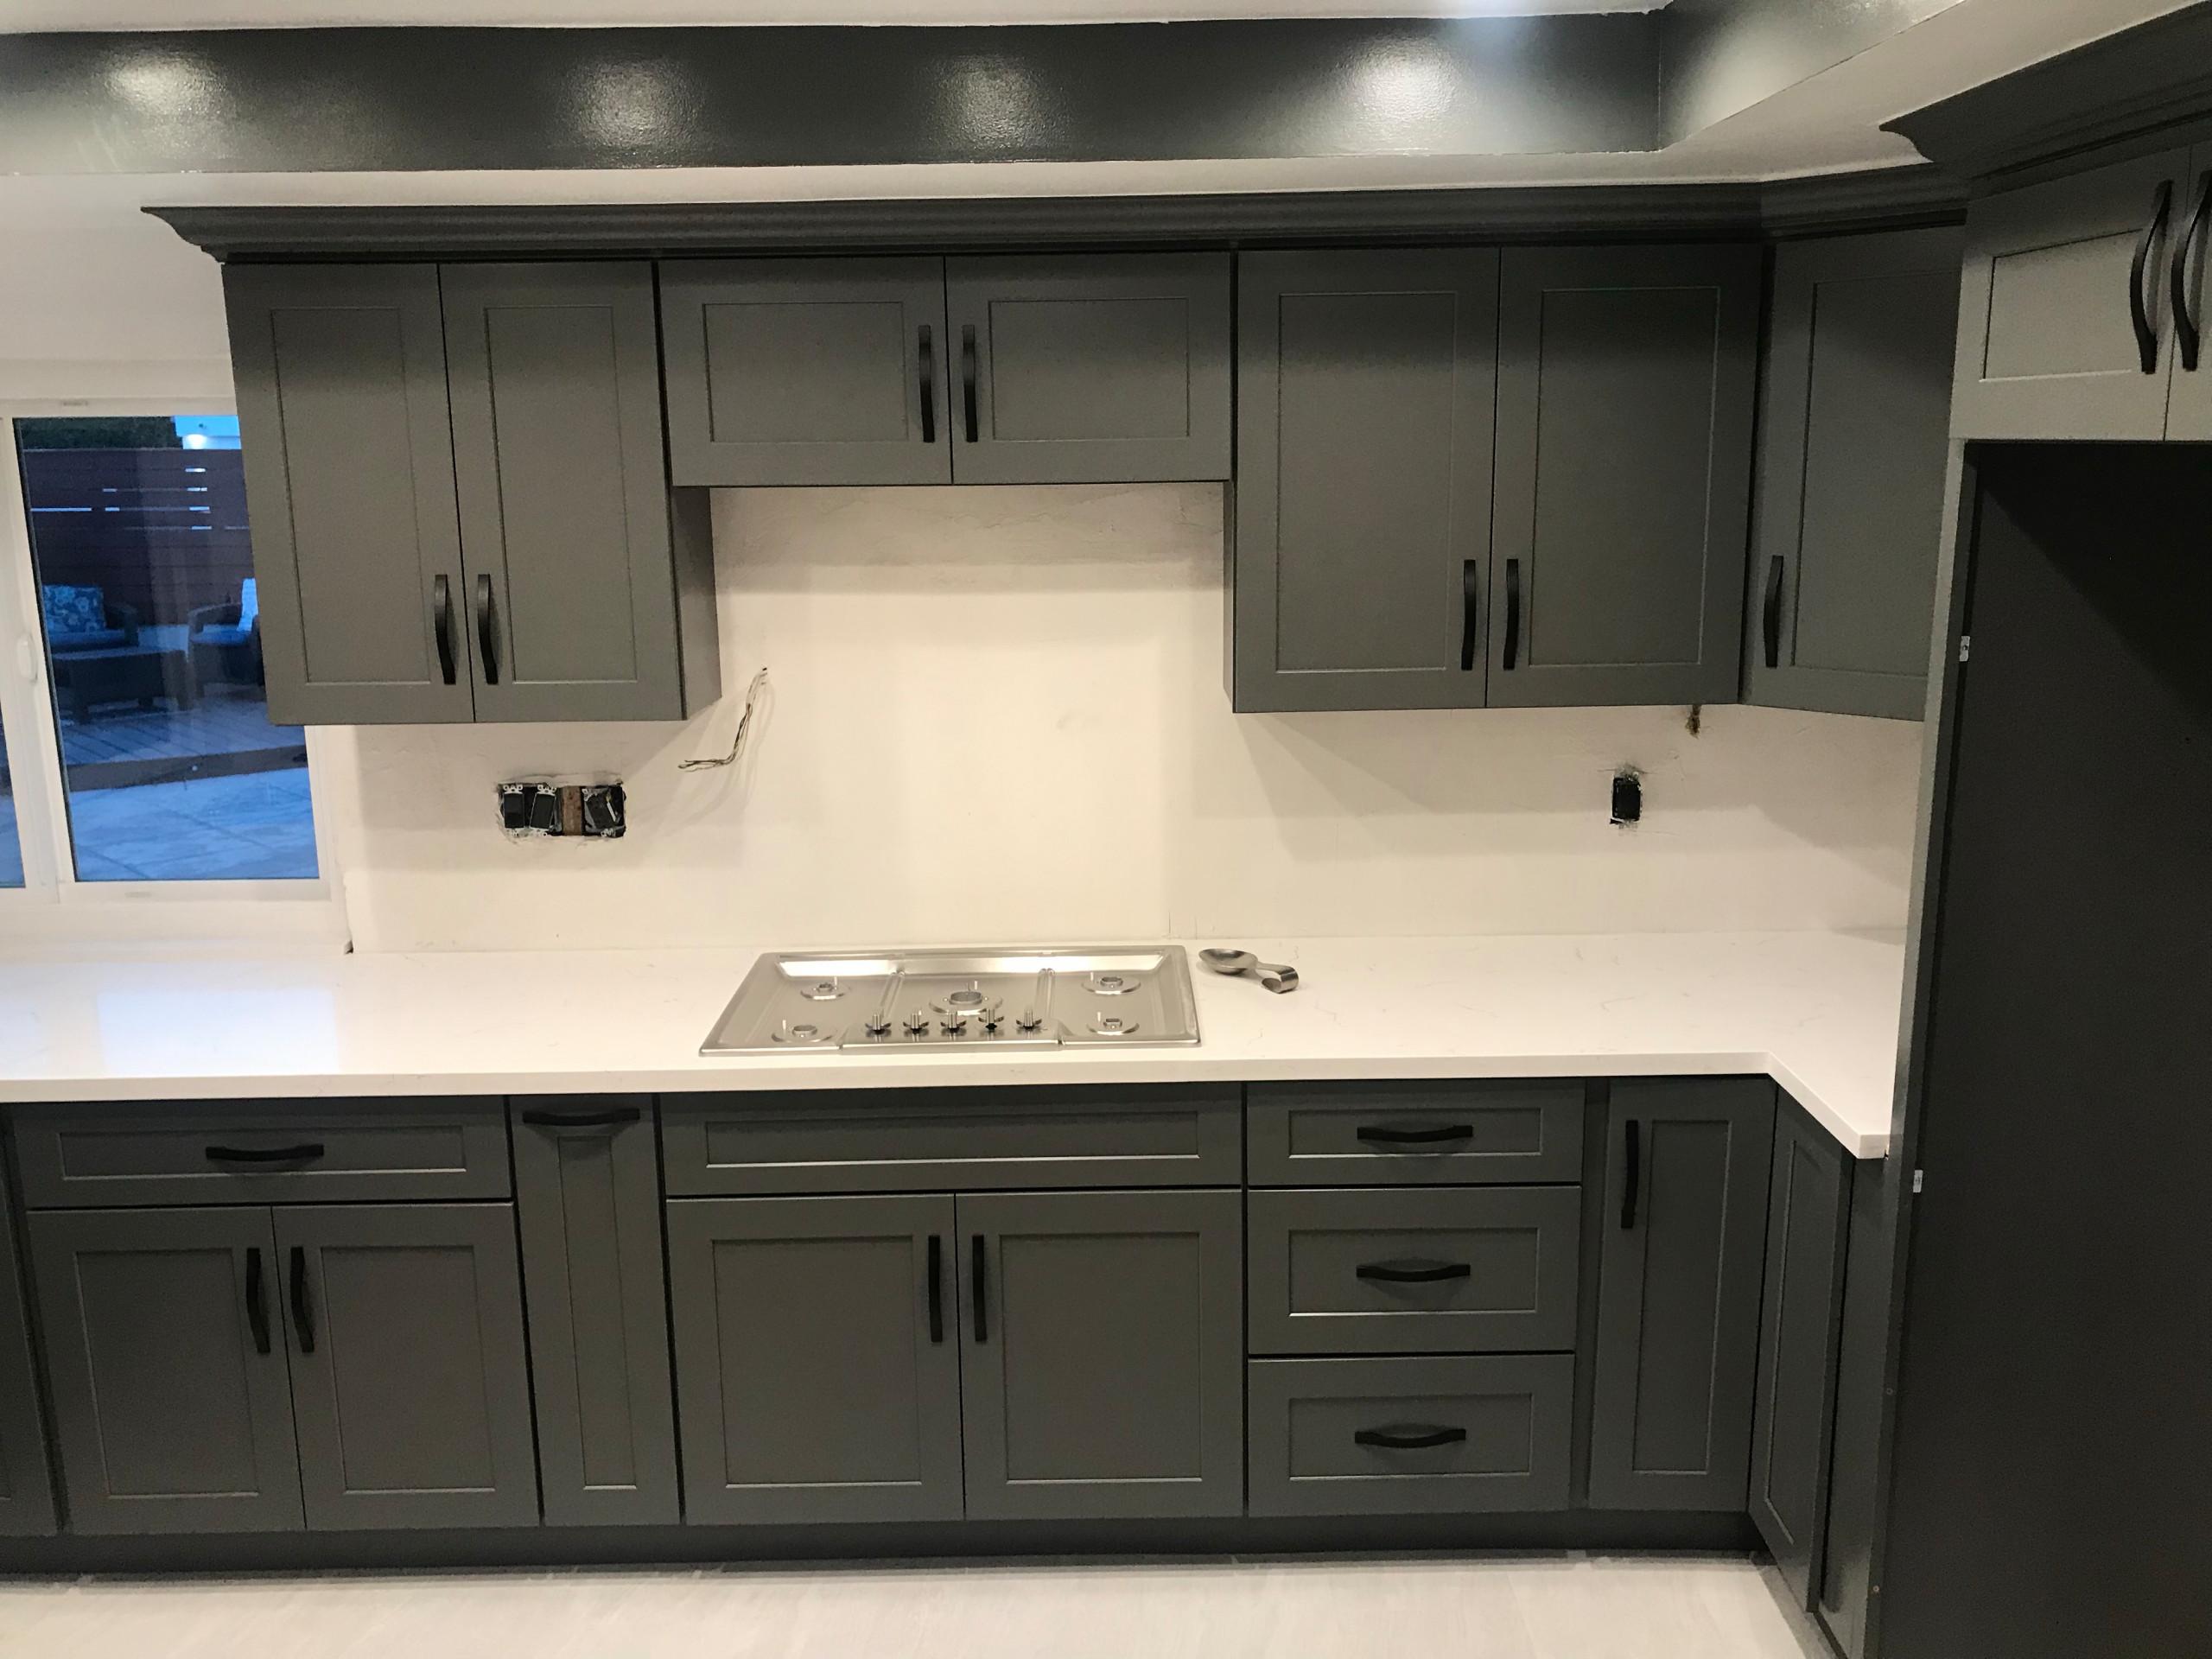 Kitchen stove top area